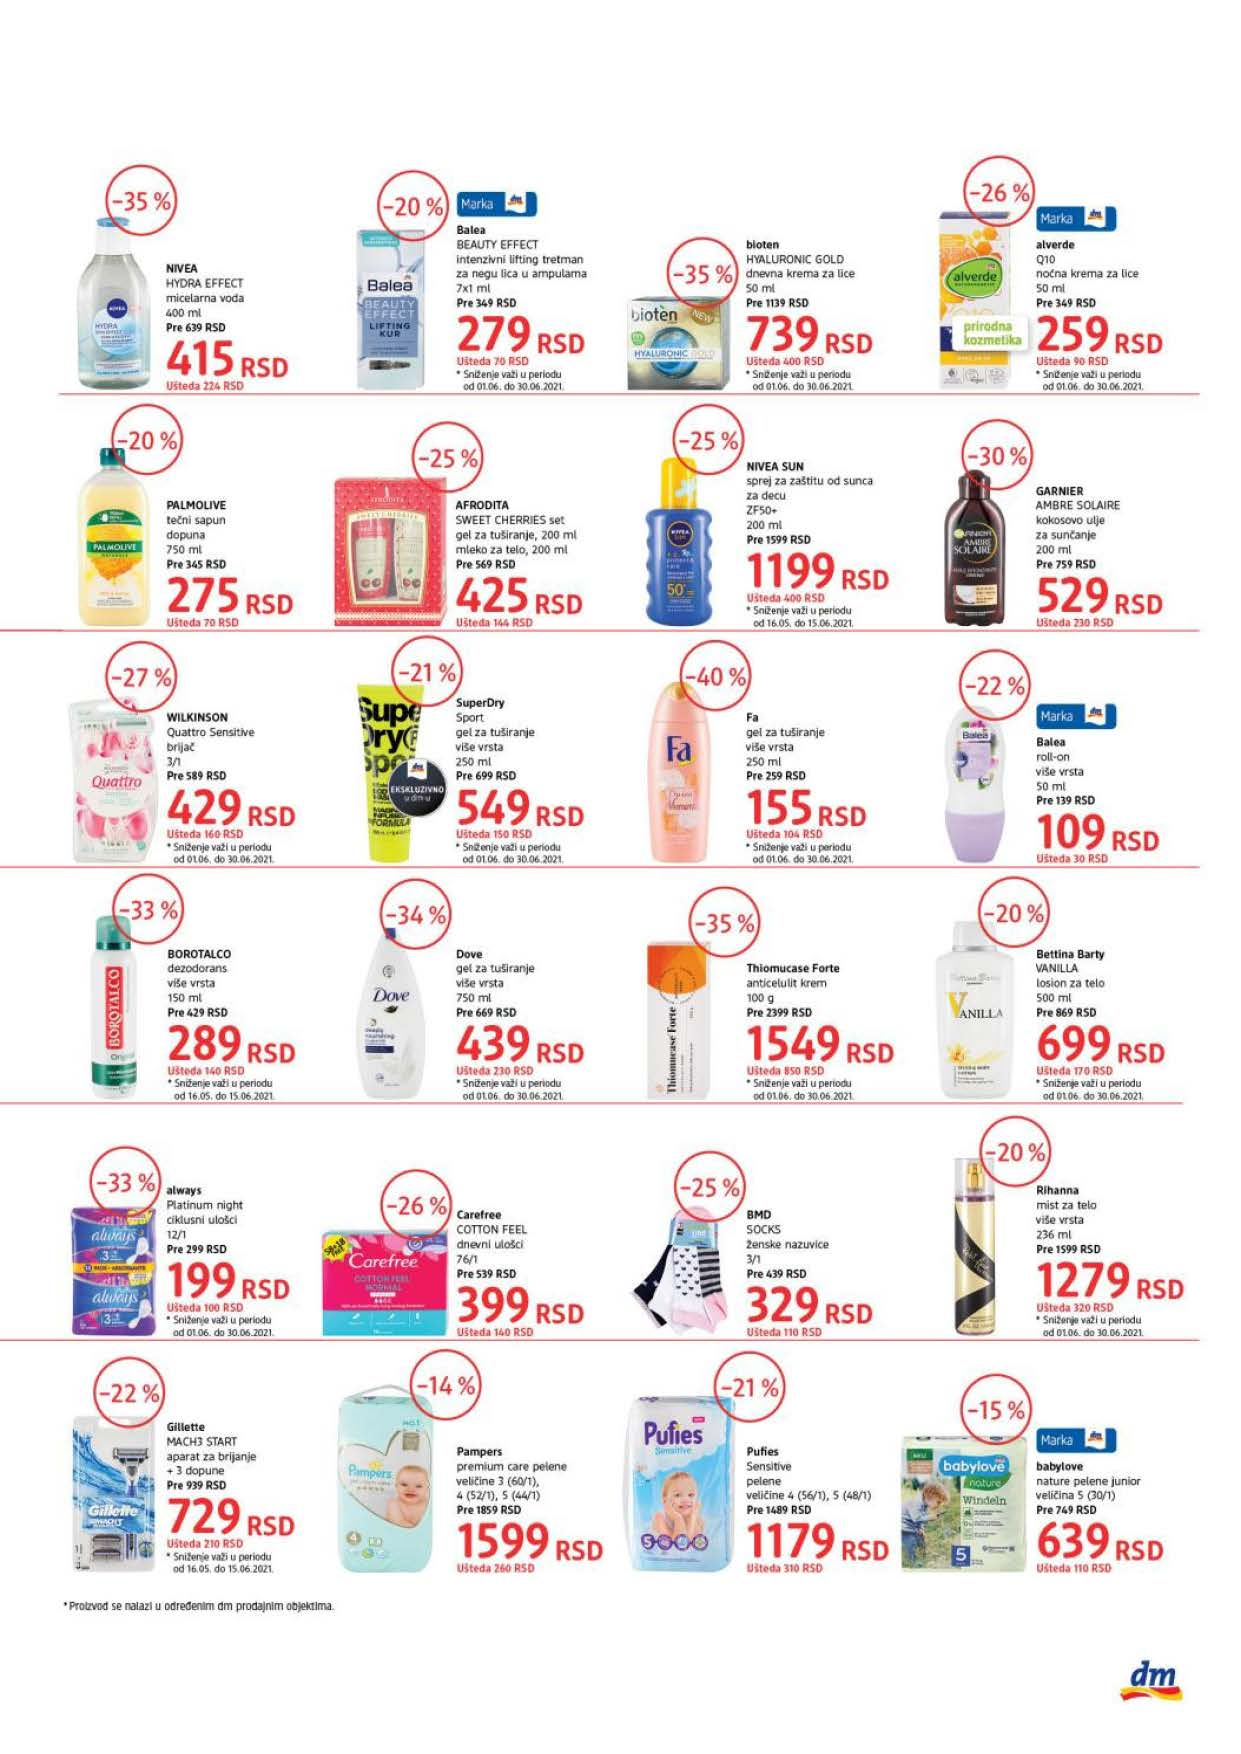 DM Katalog SRBIJA Super Cene JUN 2021 01.06.2021. 15.06.2021. eKatalozi.com PR Page 3